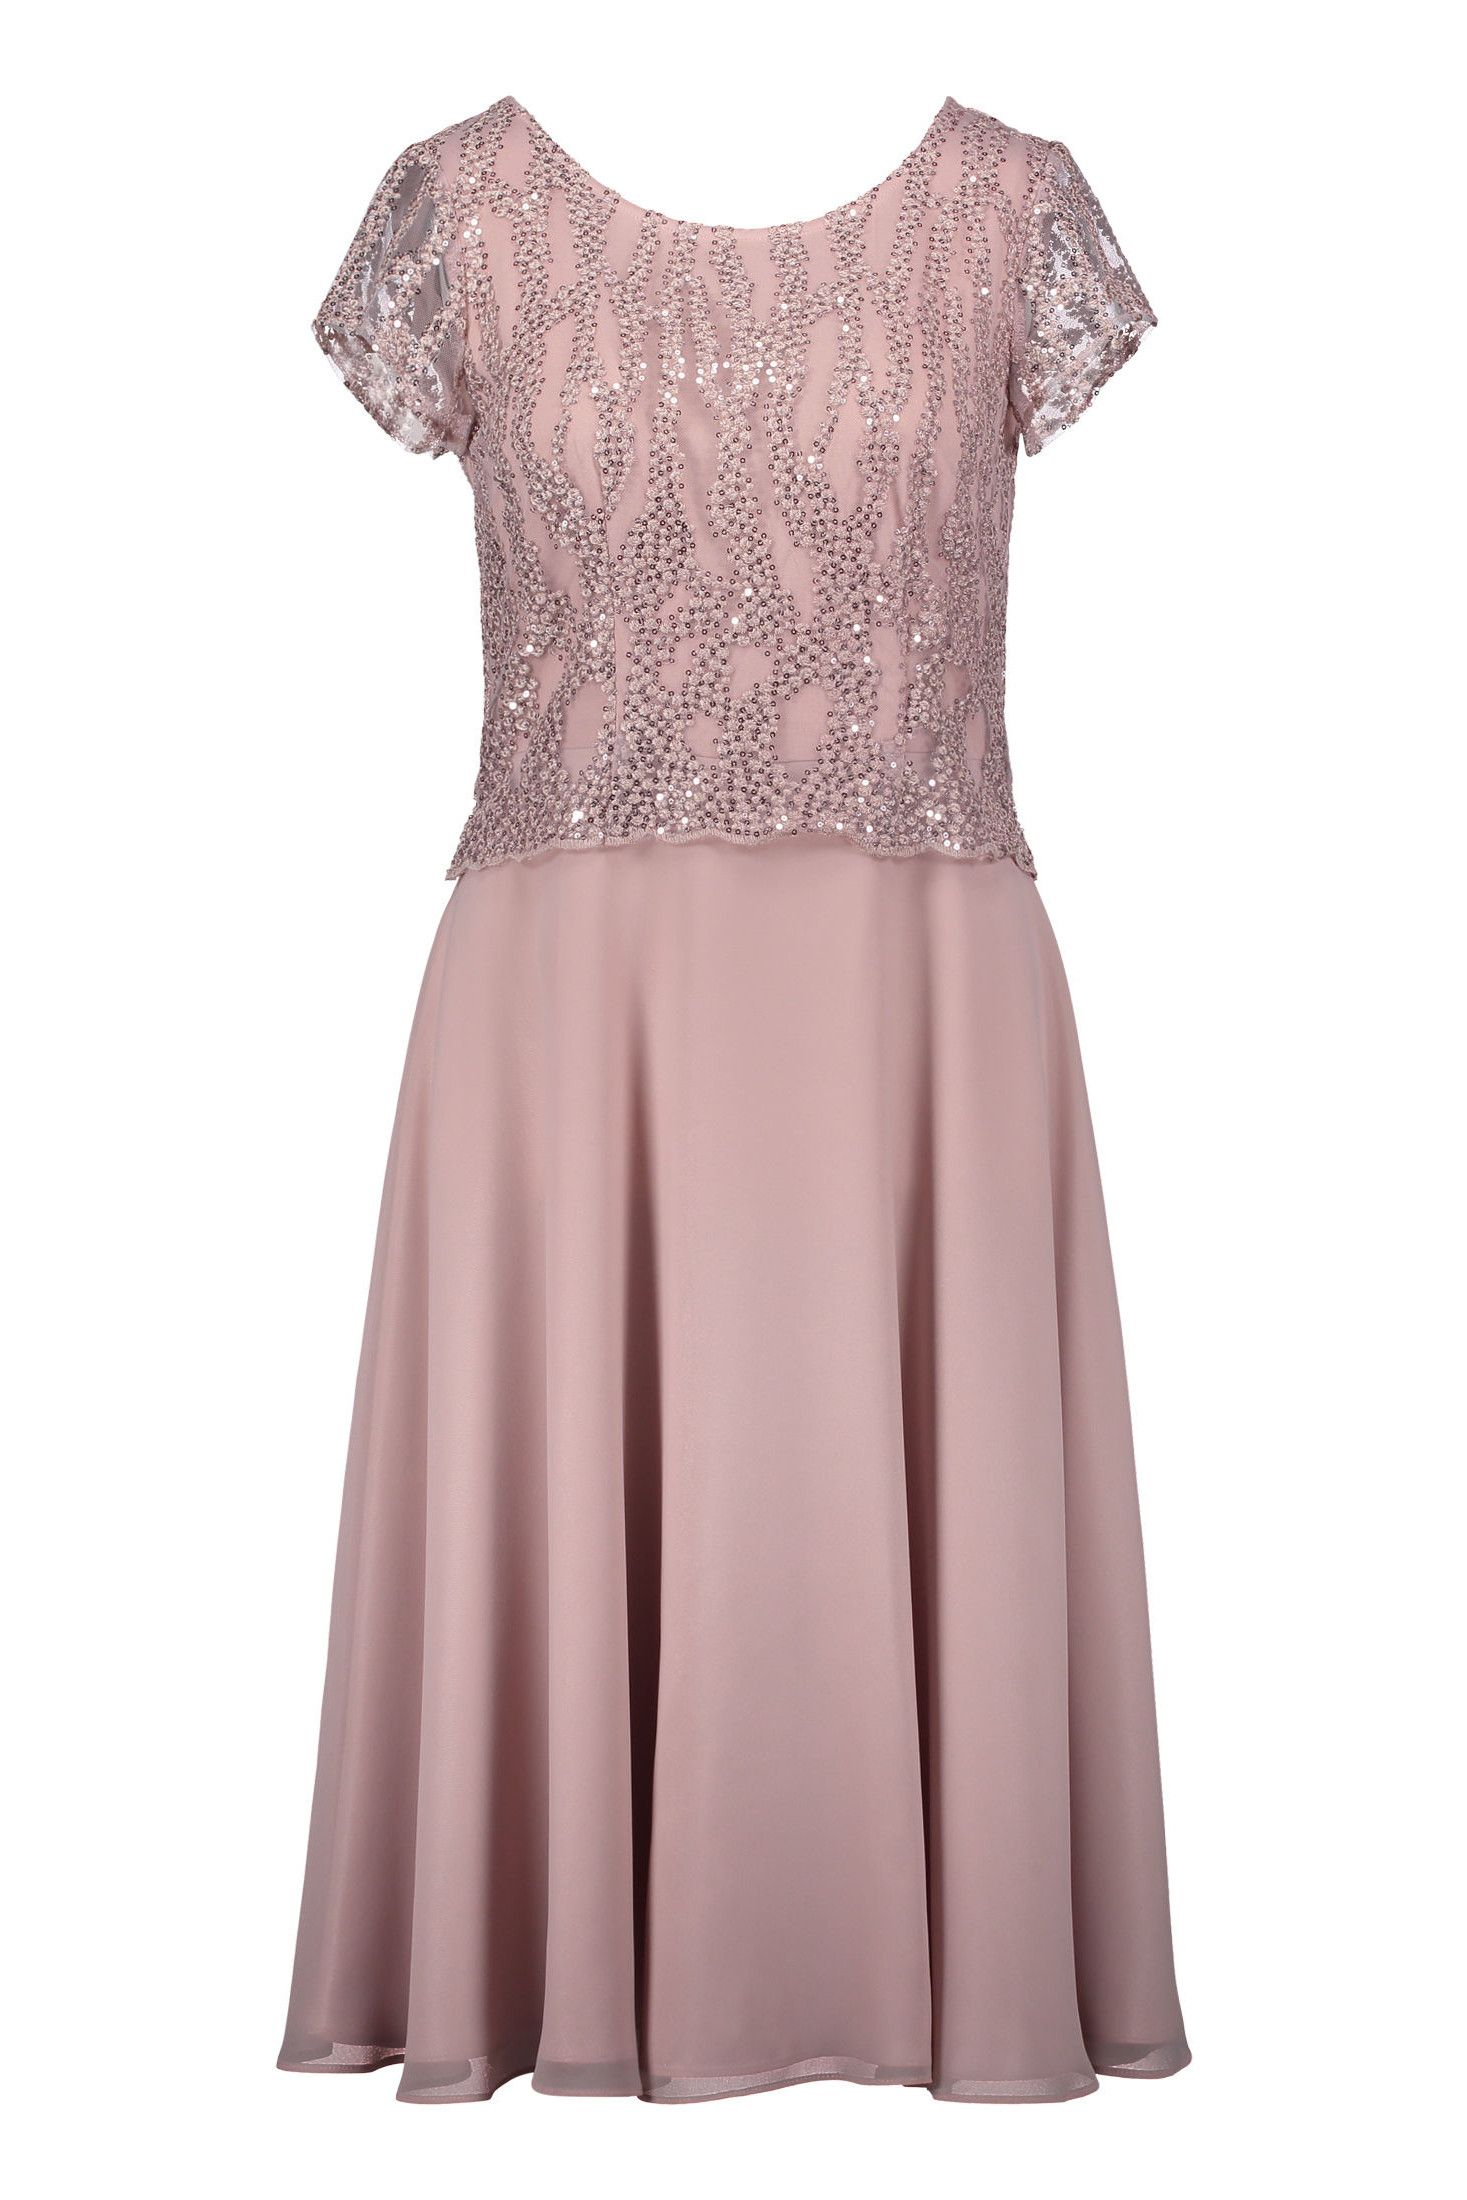 Elegantes Kleid Ärmel Rosé Chiffon Vera Mont | Mode ...